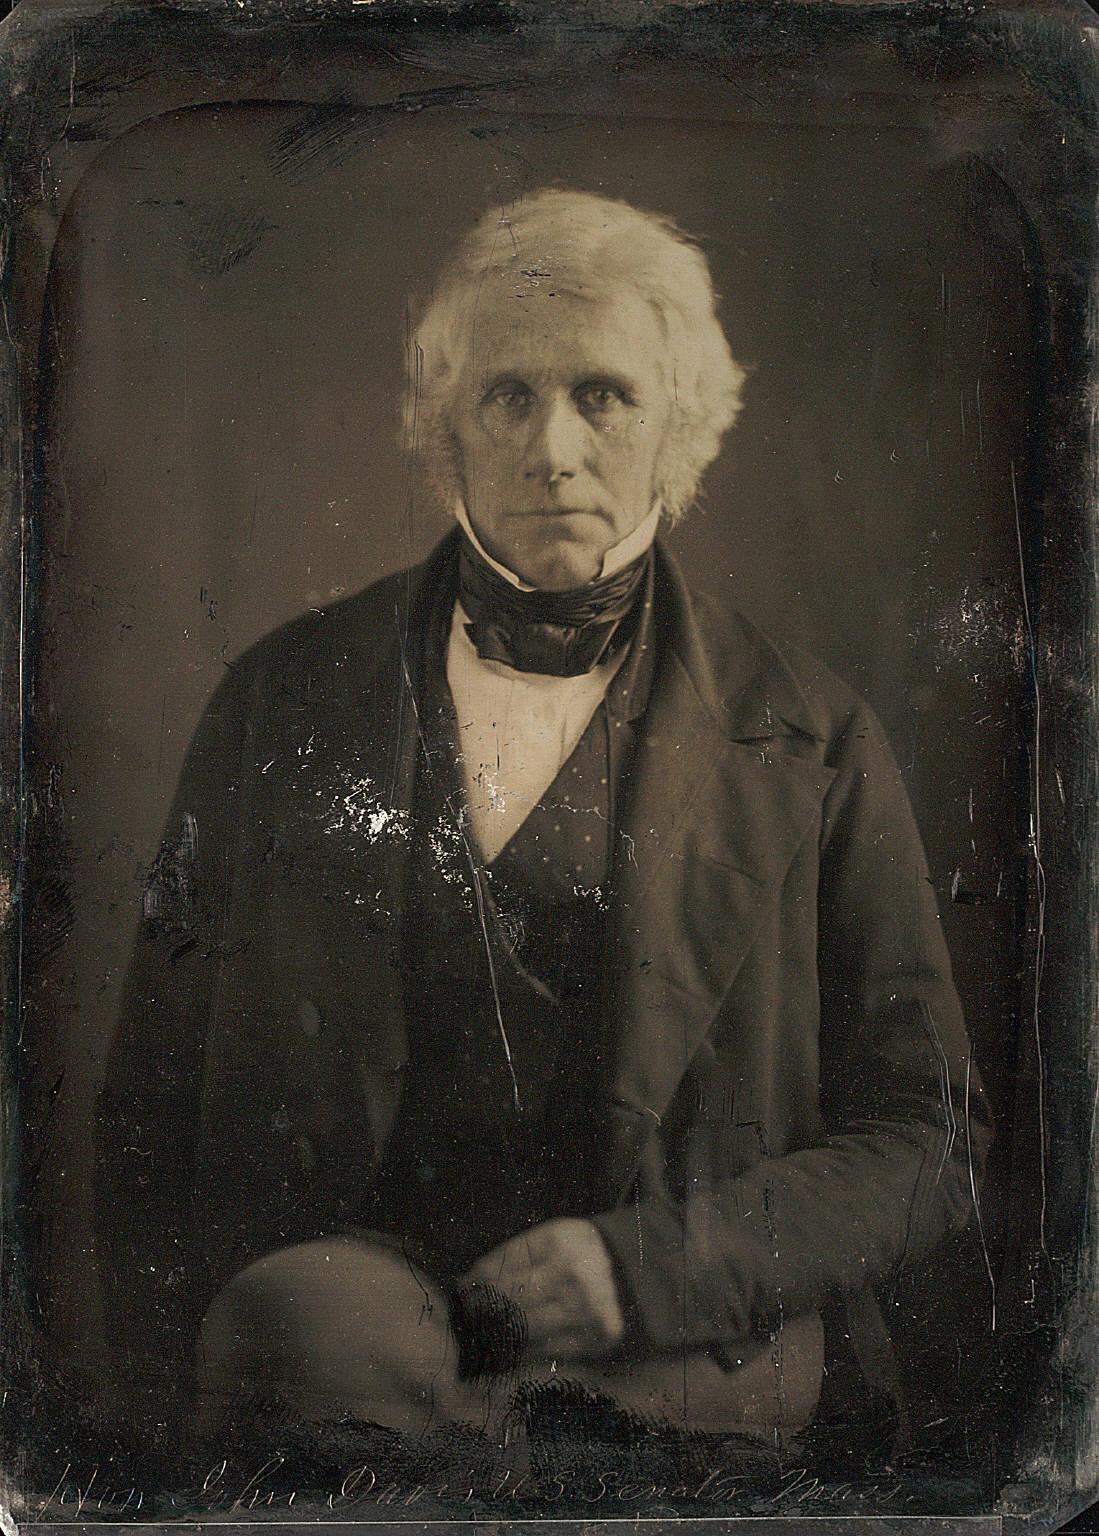 John_Davis_daguerreotype_by_Mathew_Brady_1849